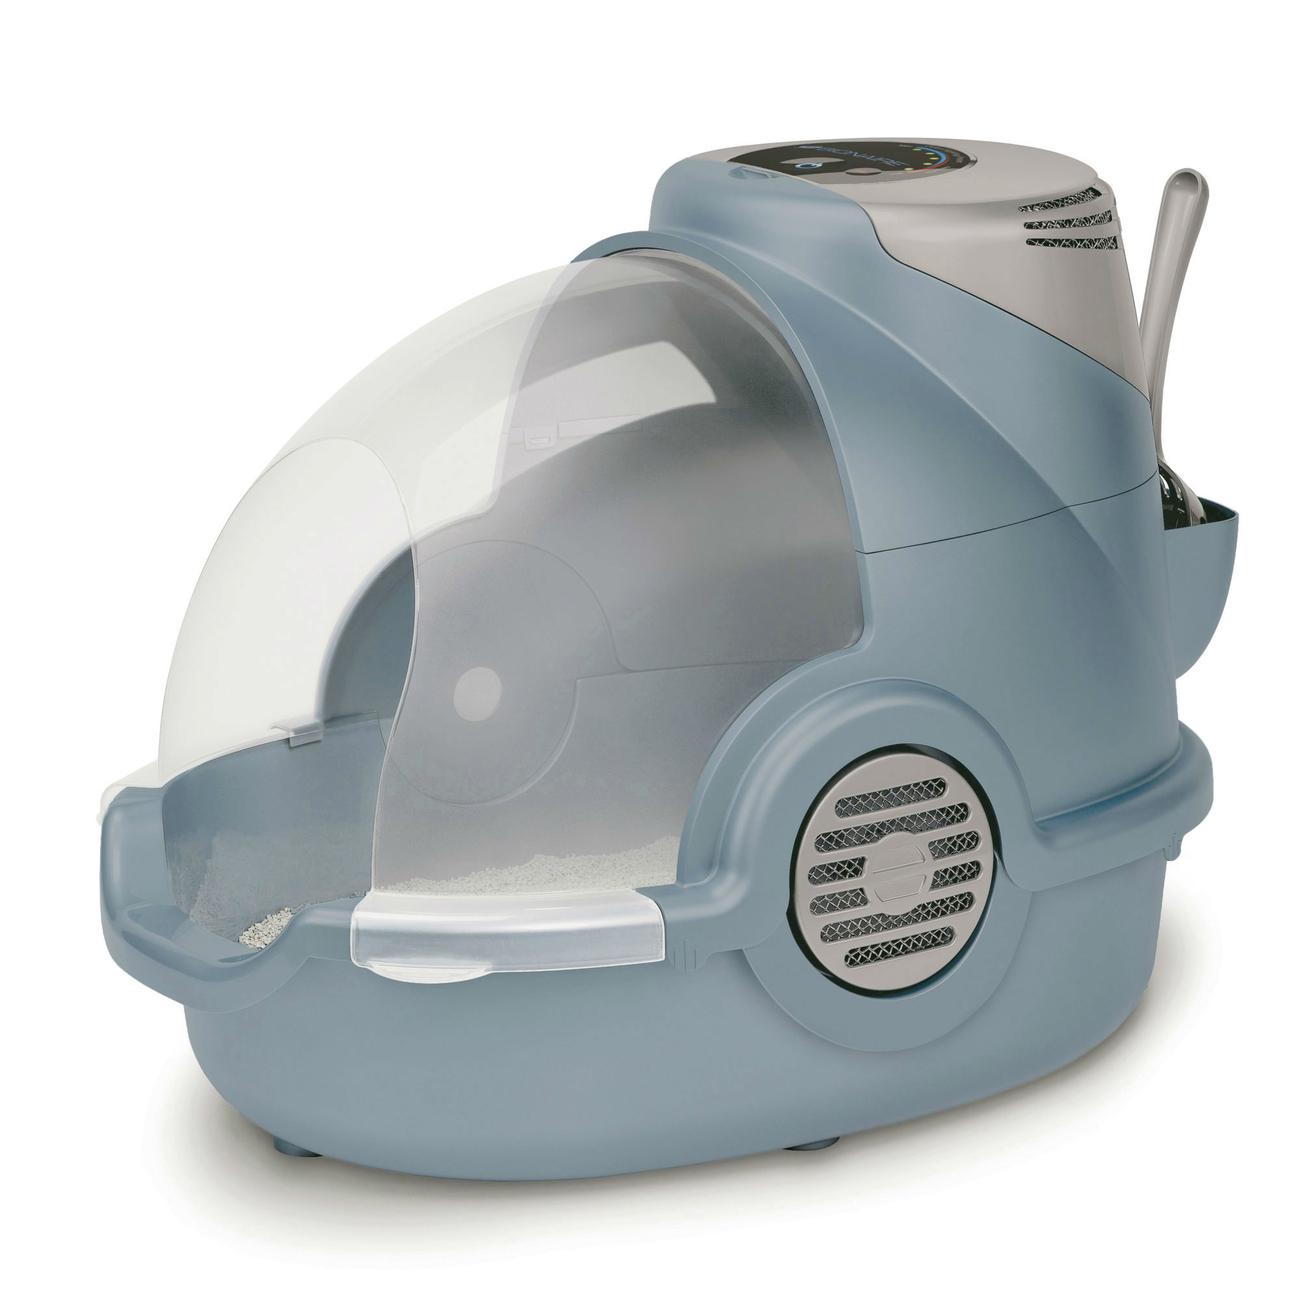 Oster Bionaire Geruch entfernende Katzentoilette, Komplettset, 66x36x47cm